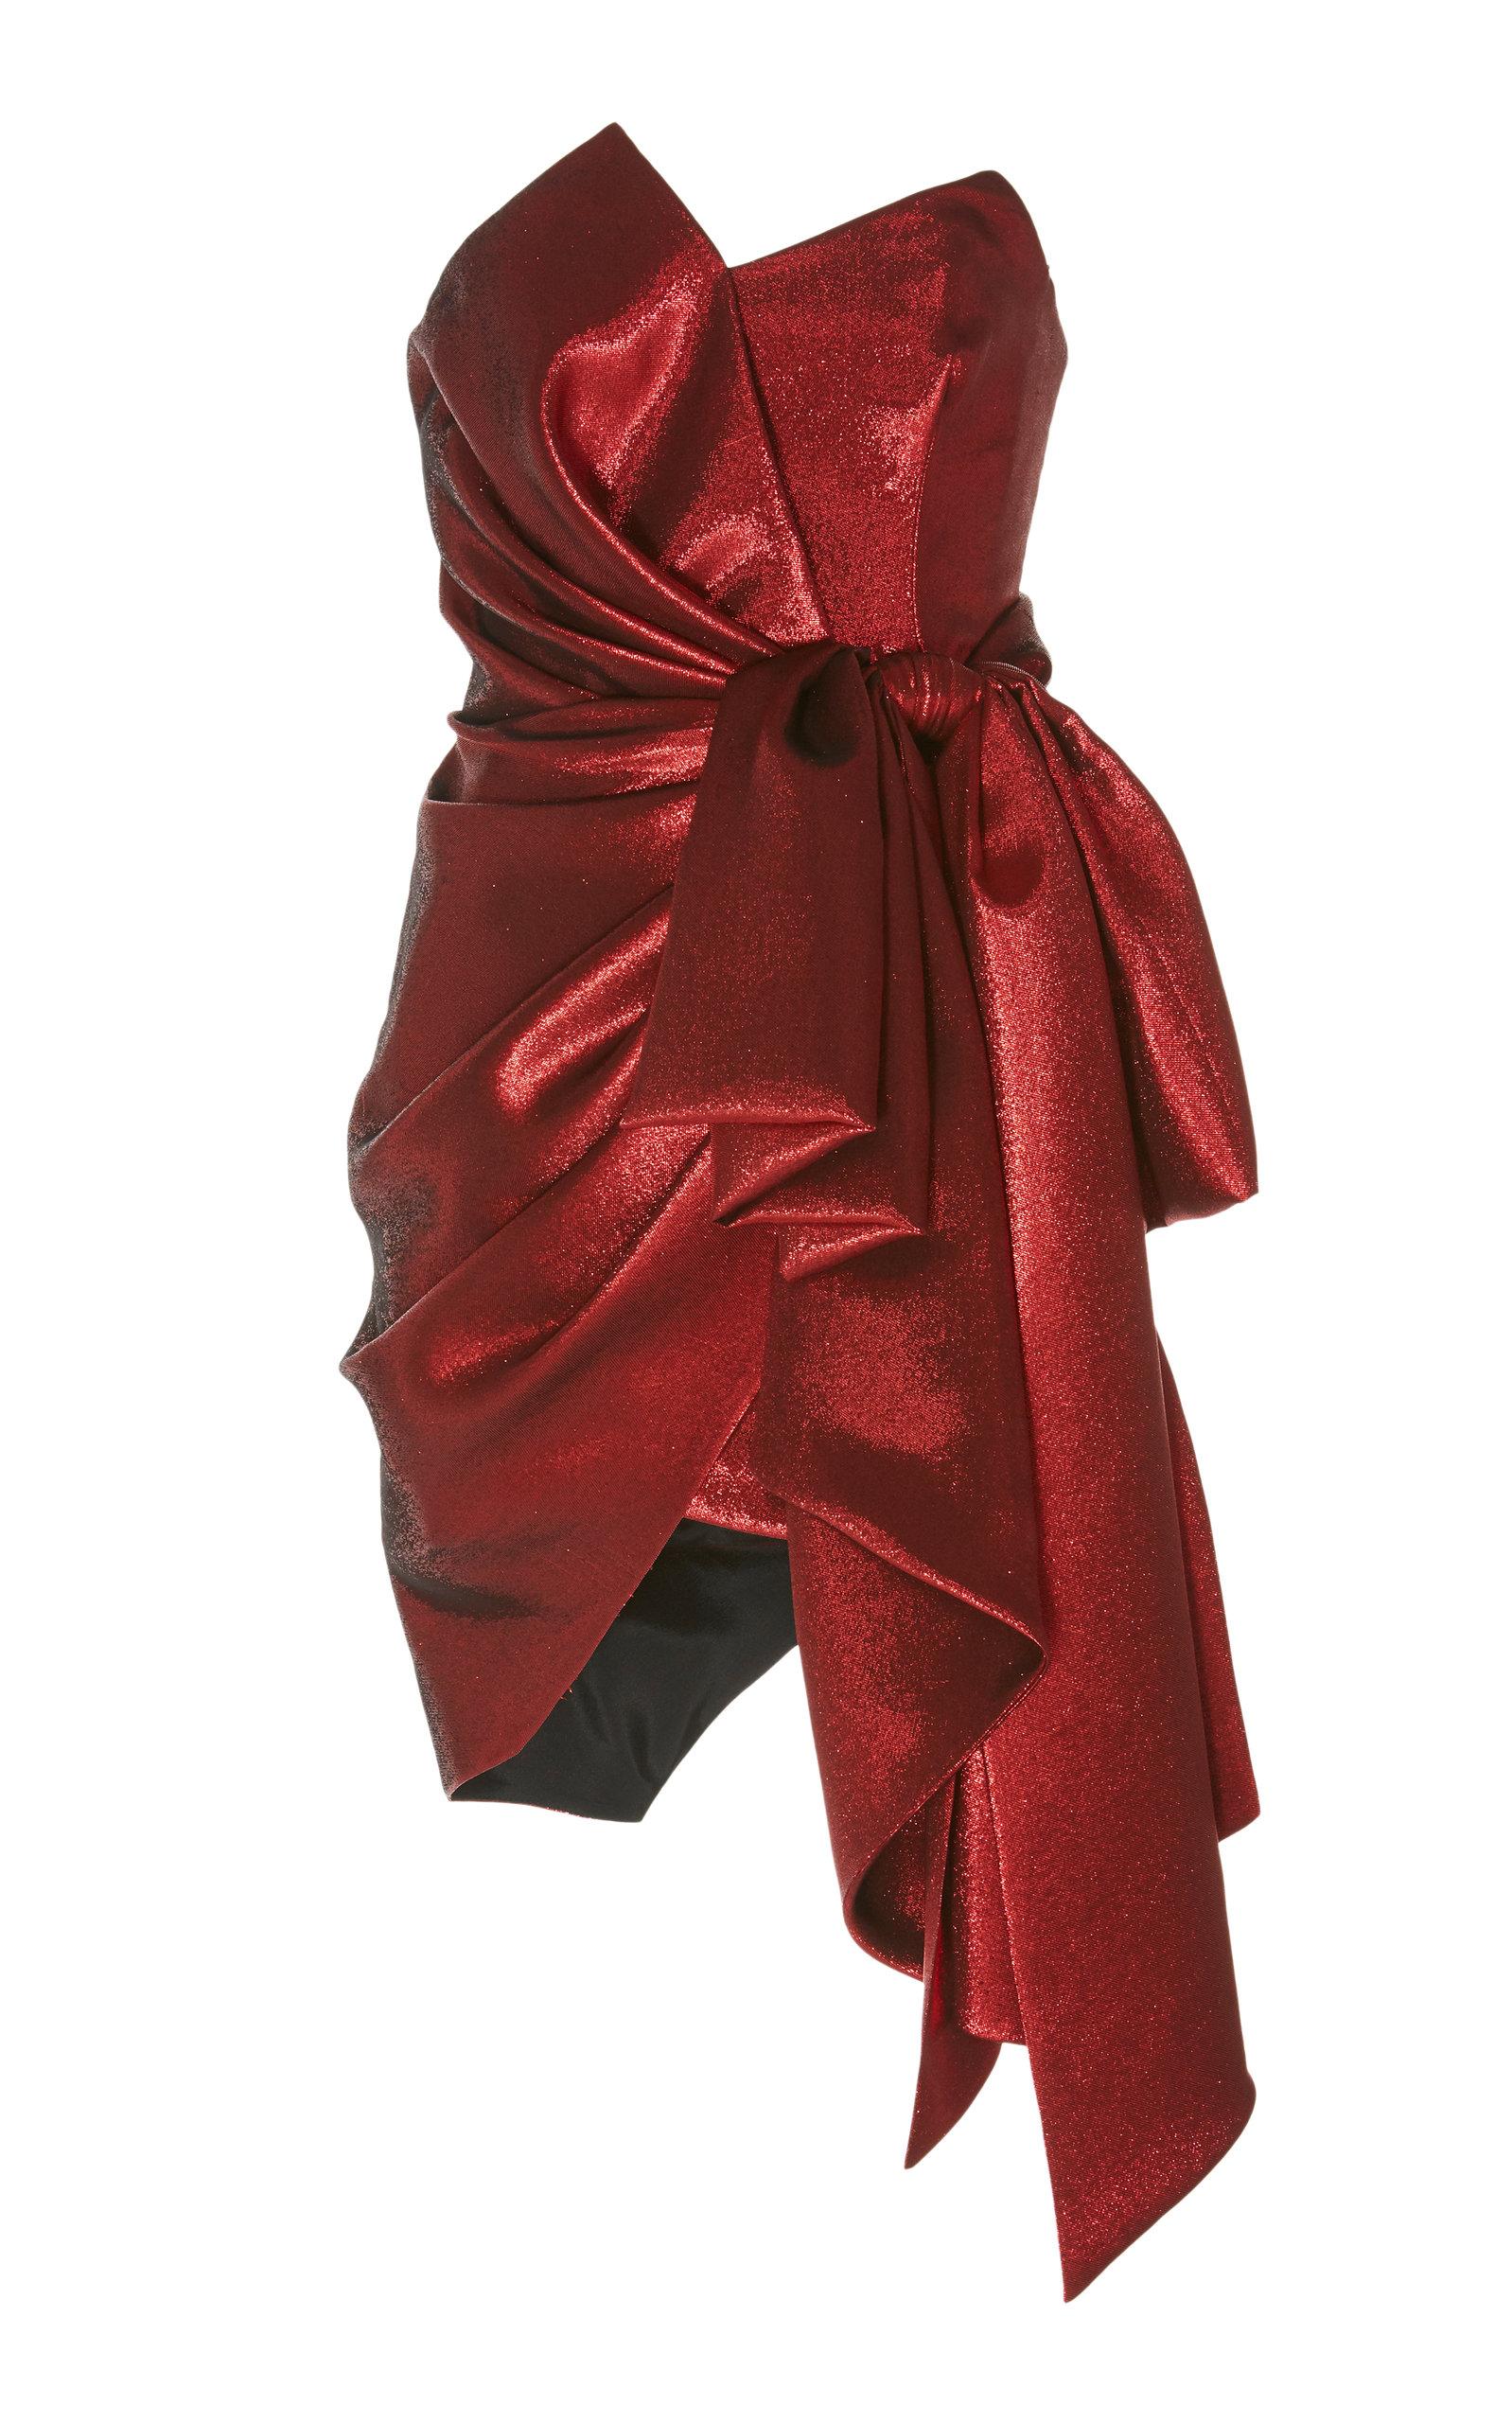 ALEXANDRE VAUTHIER Oversized Bow Mini Dress in Red